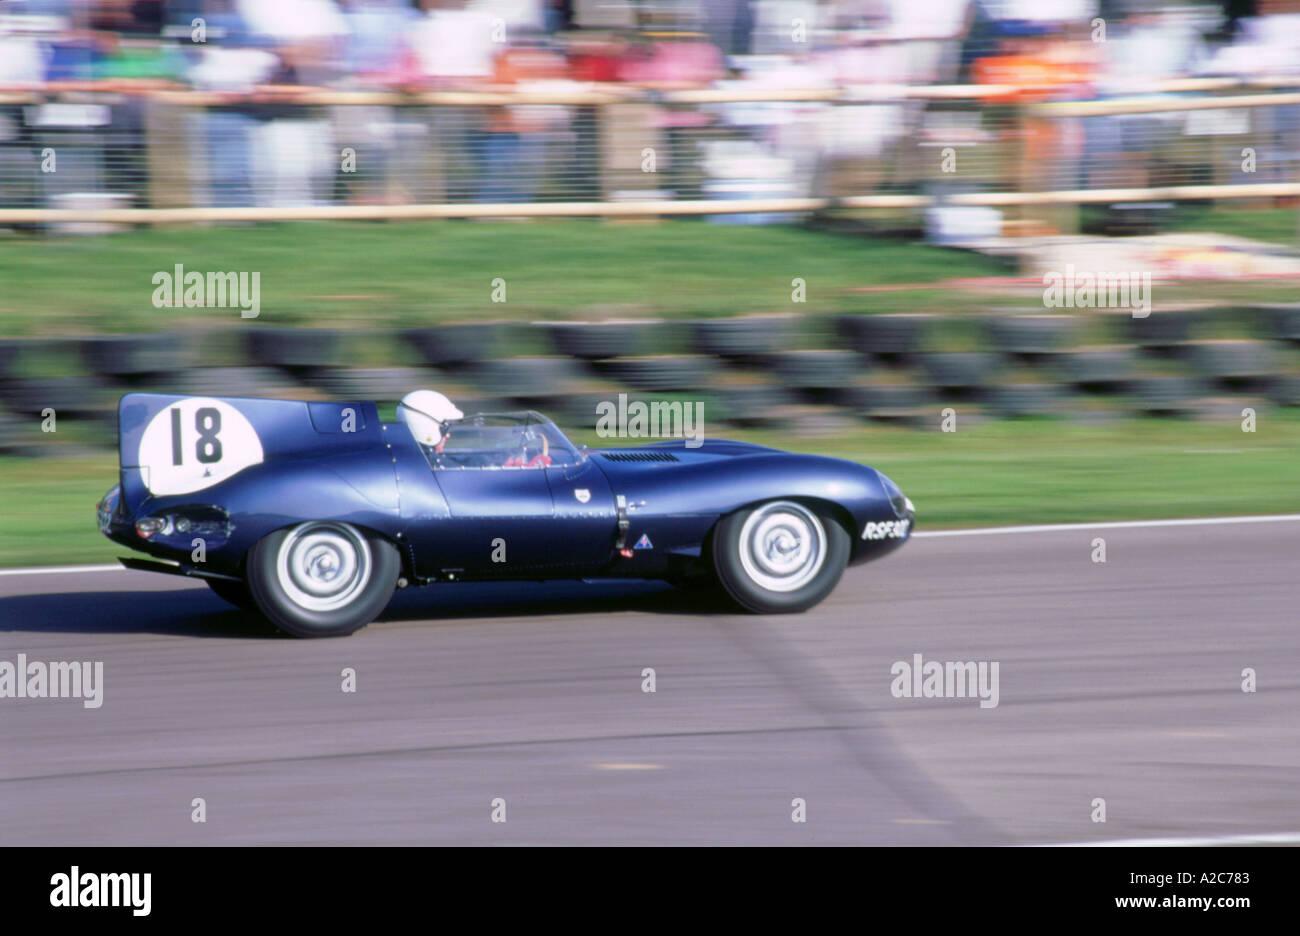 1998 Goodwood Revival Meeting Jaguar D Type   Stock Image